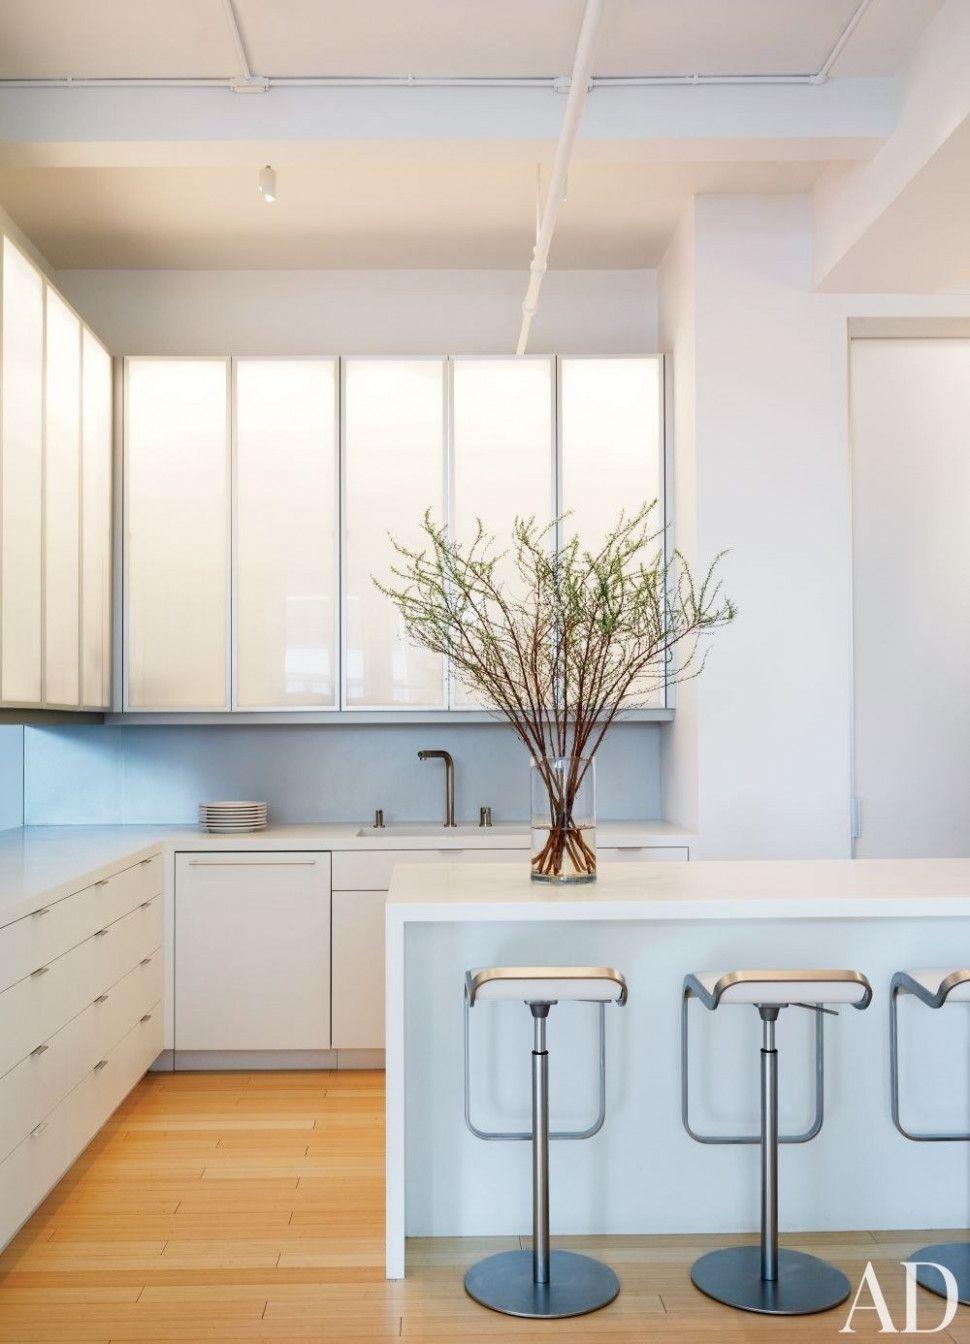 20 Ideas Kitchen Cabinets New York City Becker, S.R ...